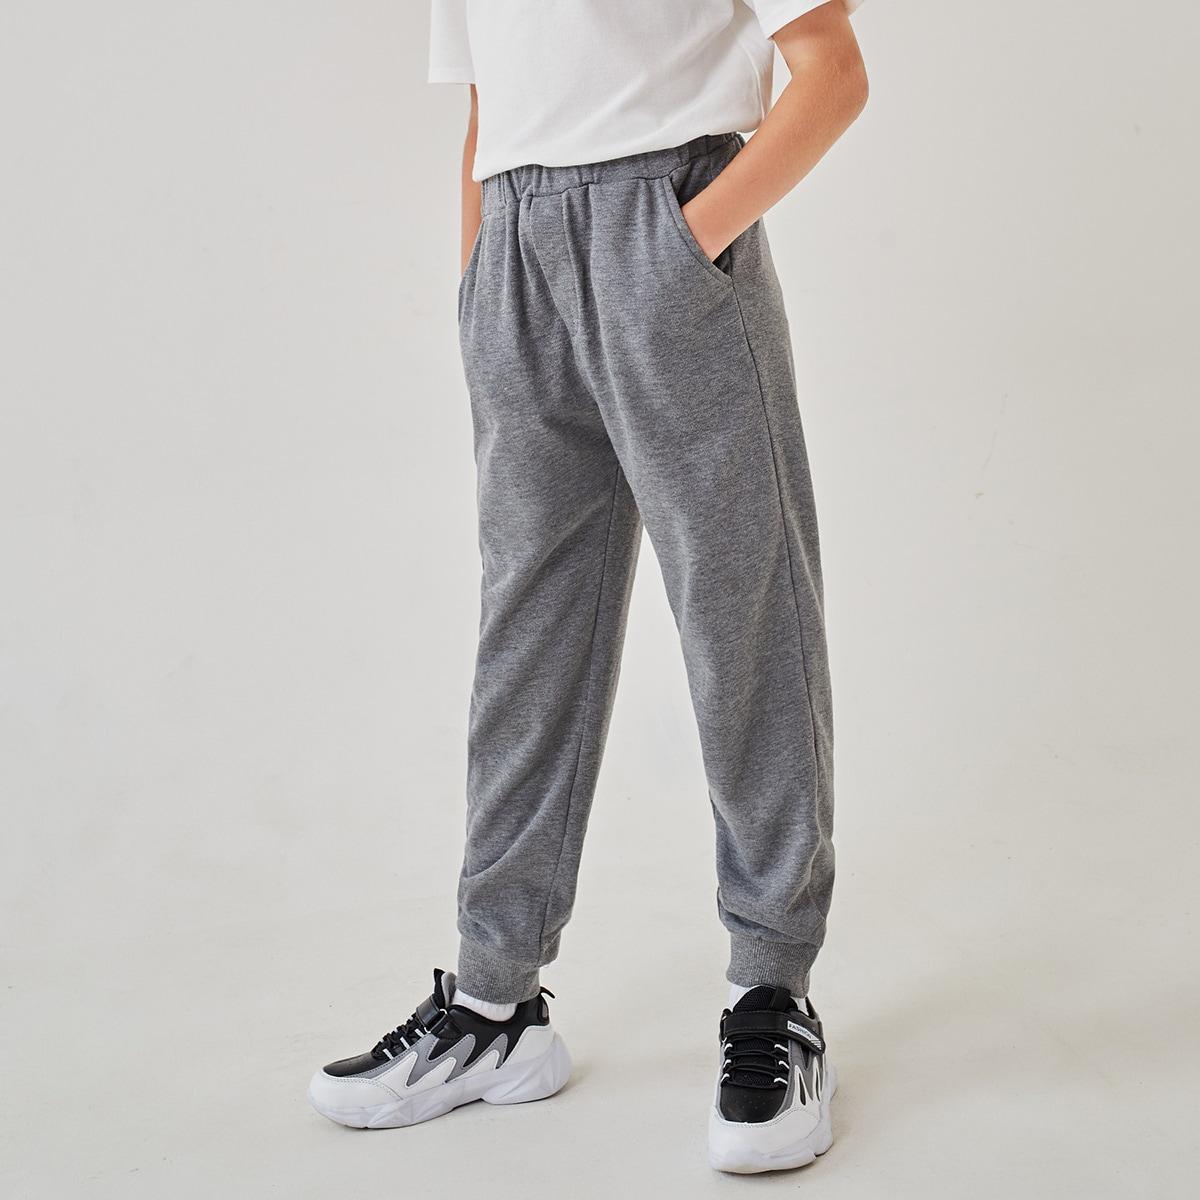 Boys Elastic Waist Sweatpants, SHEIN  - buy with discount